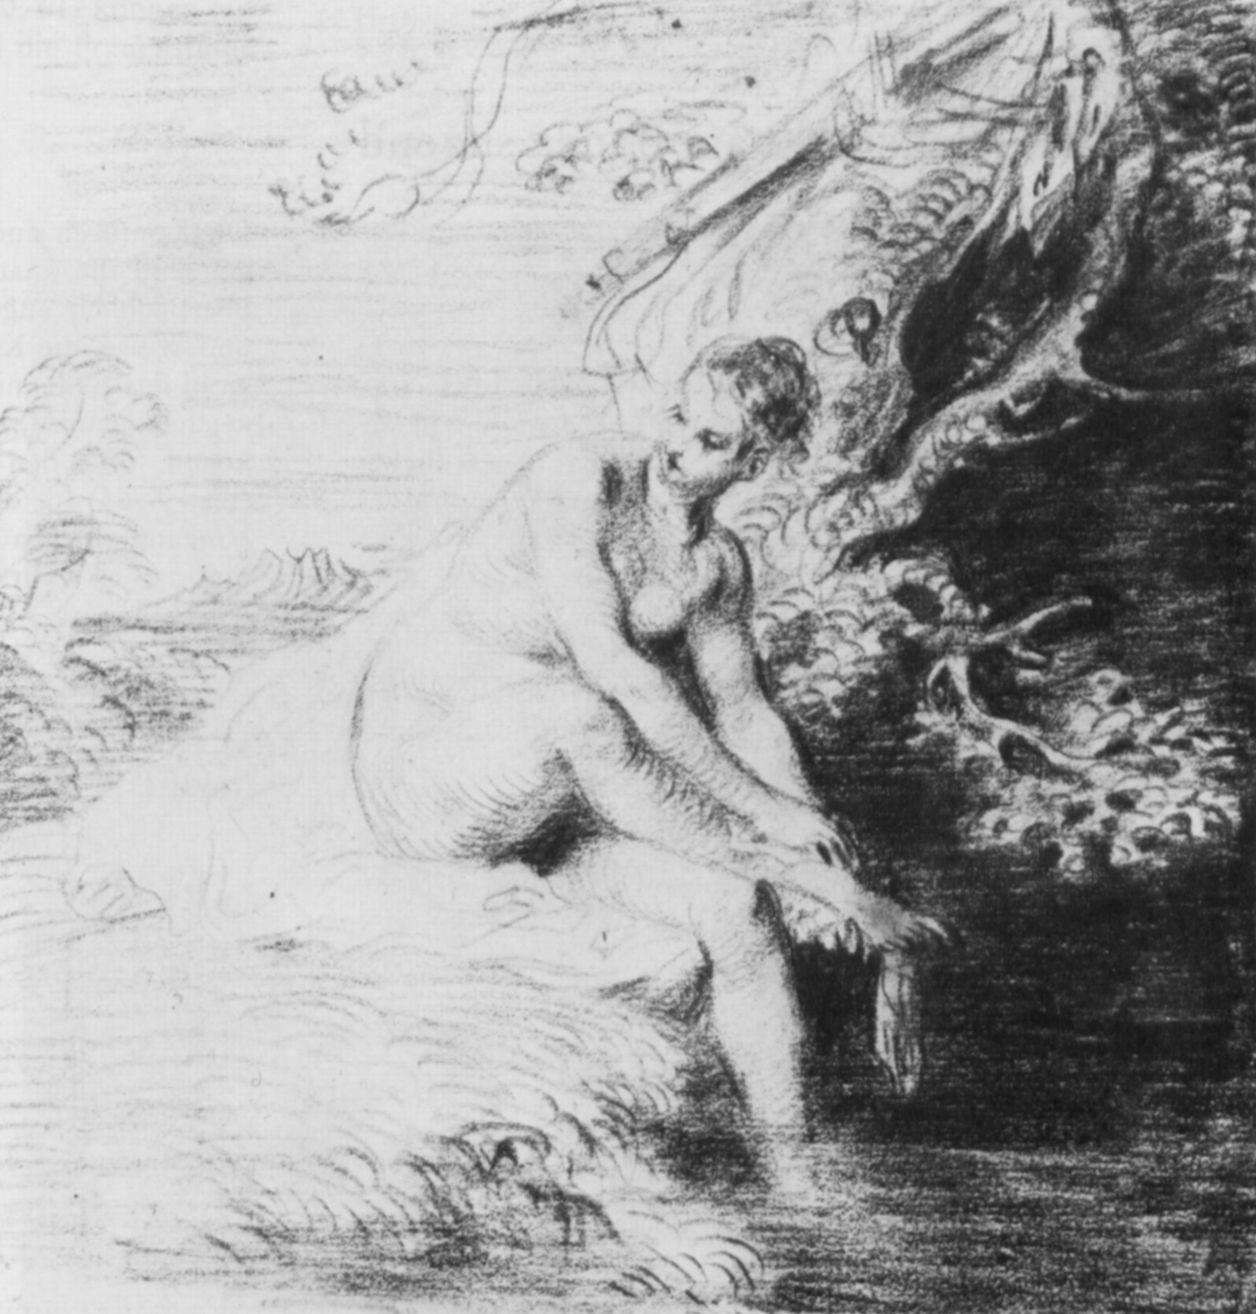 Watteau, Antoine: Bad der Diana - Zeno.org